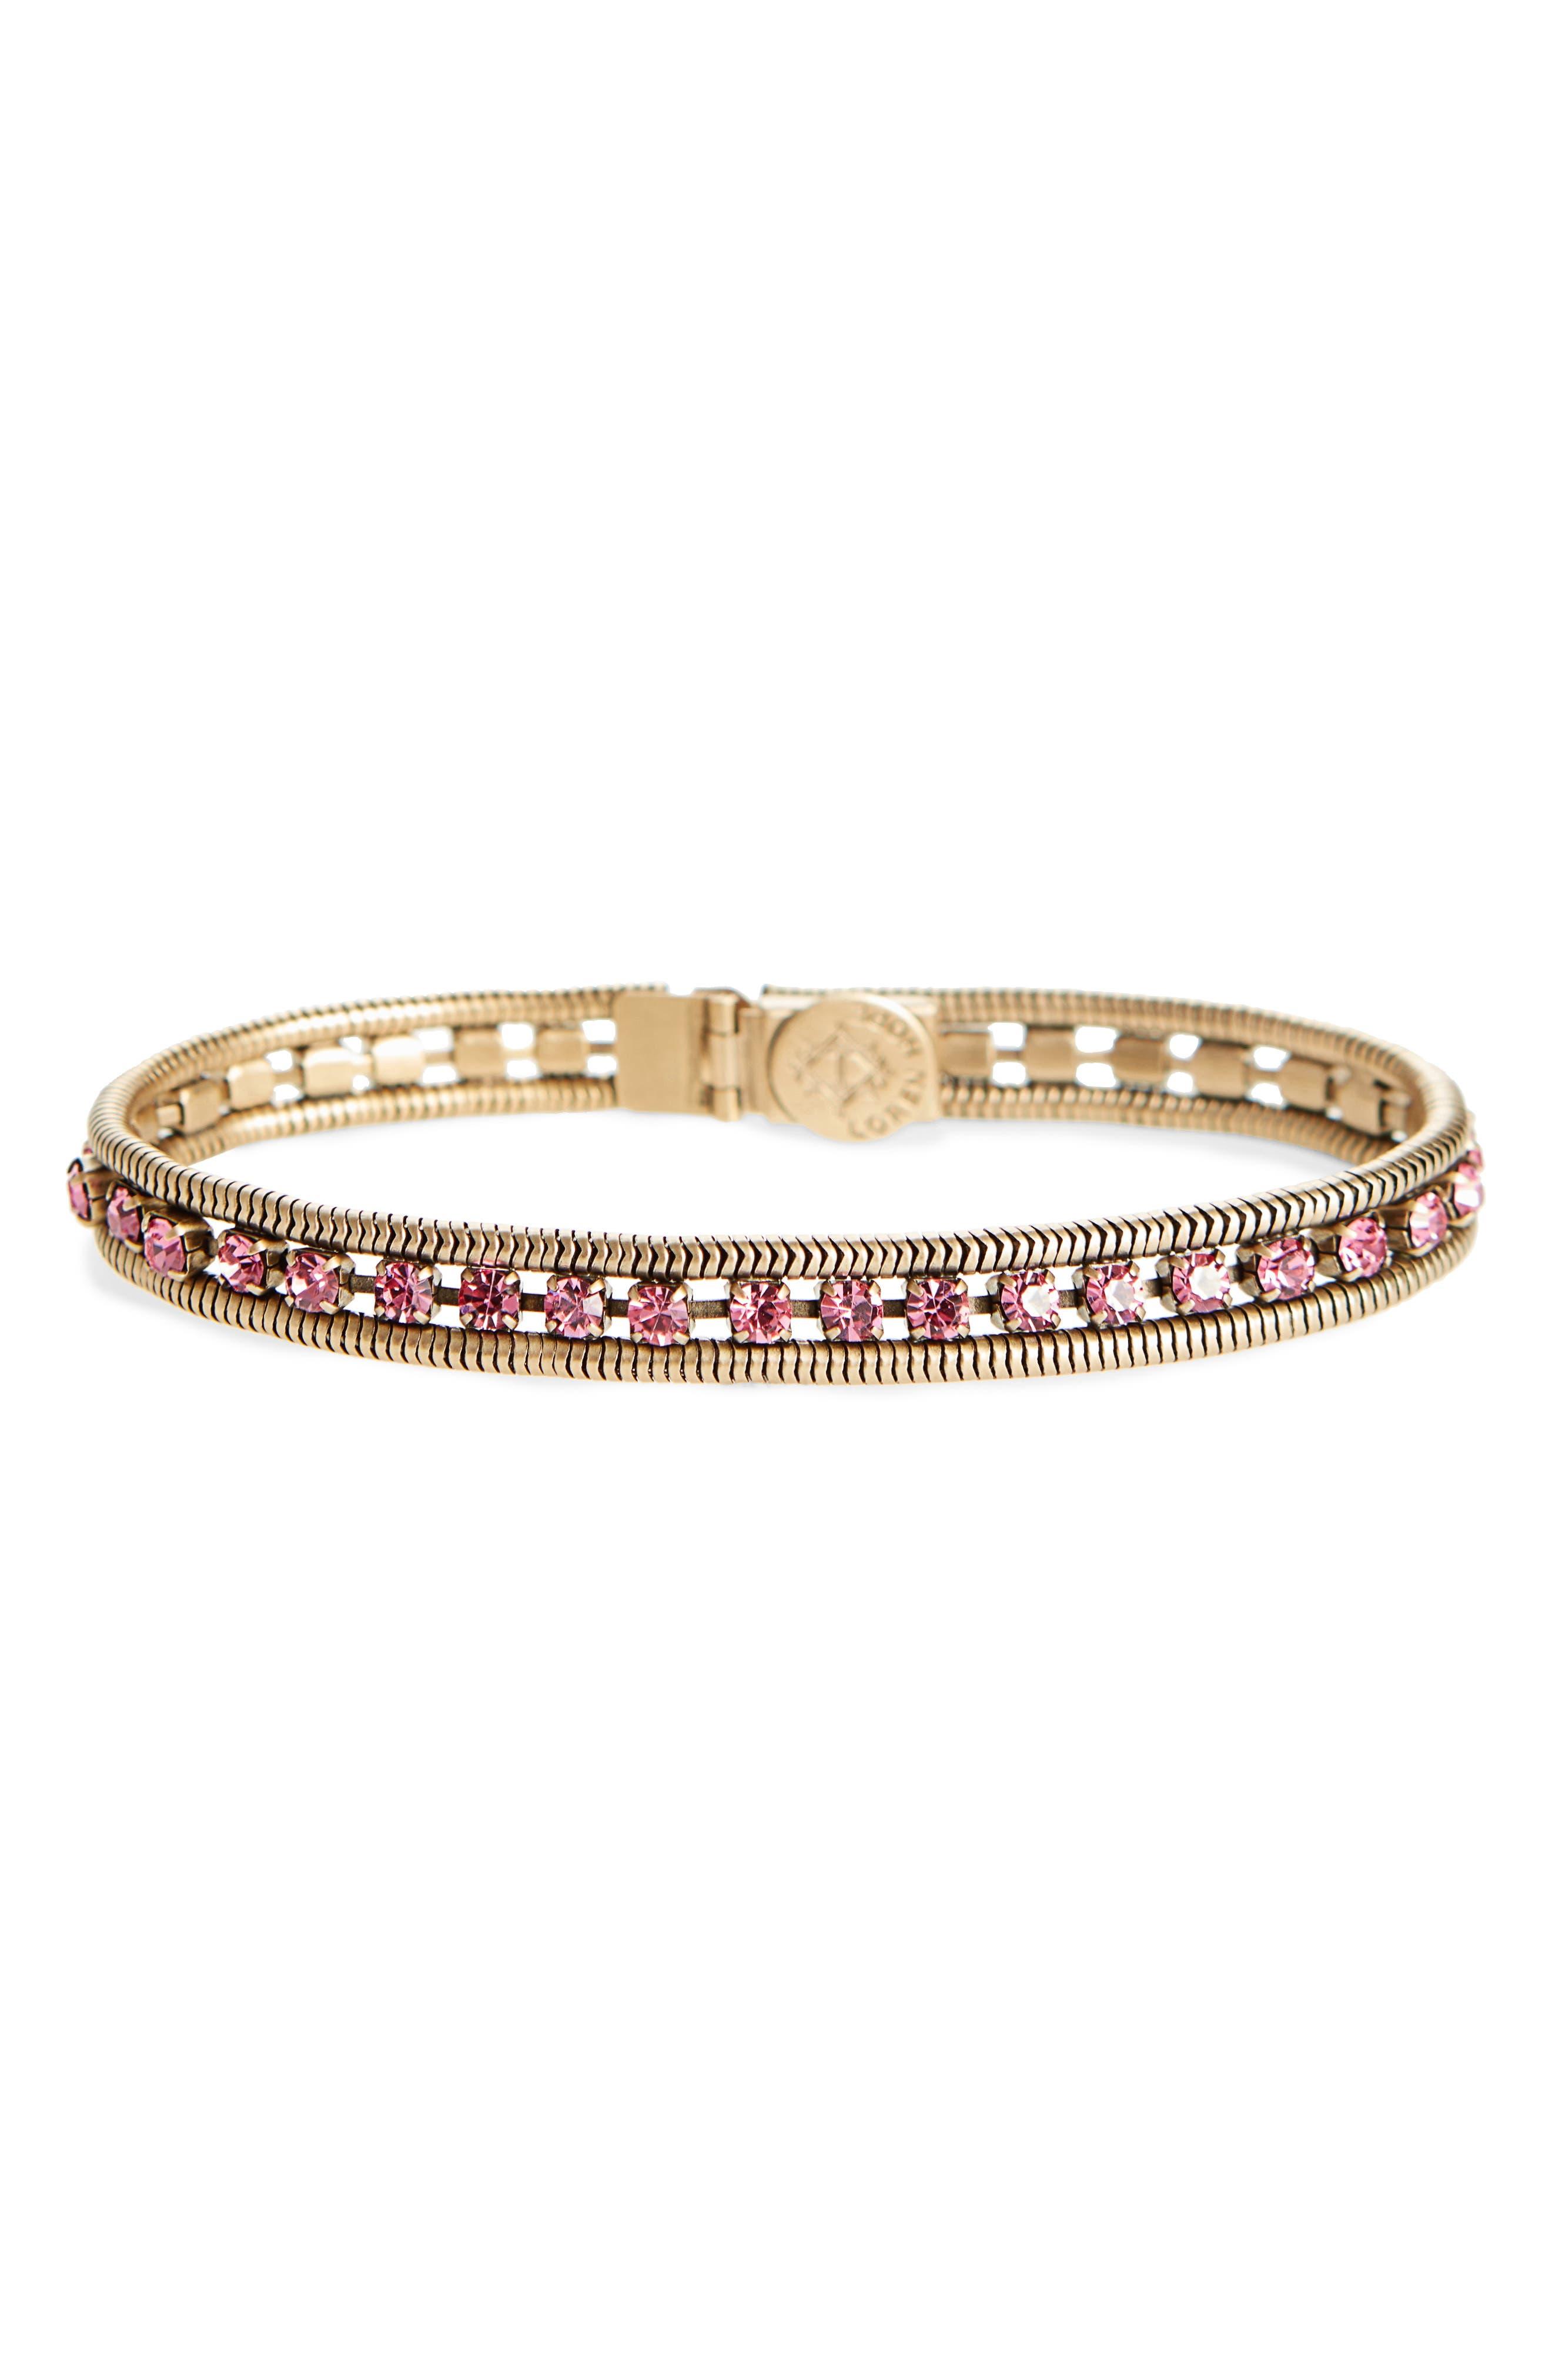 Alternate Image 1 Selected - Loren Hope 'Clara' Crystal Bracelet